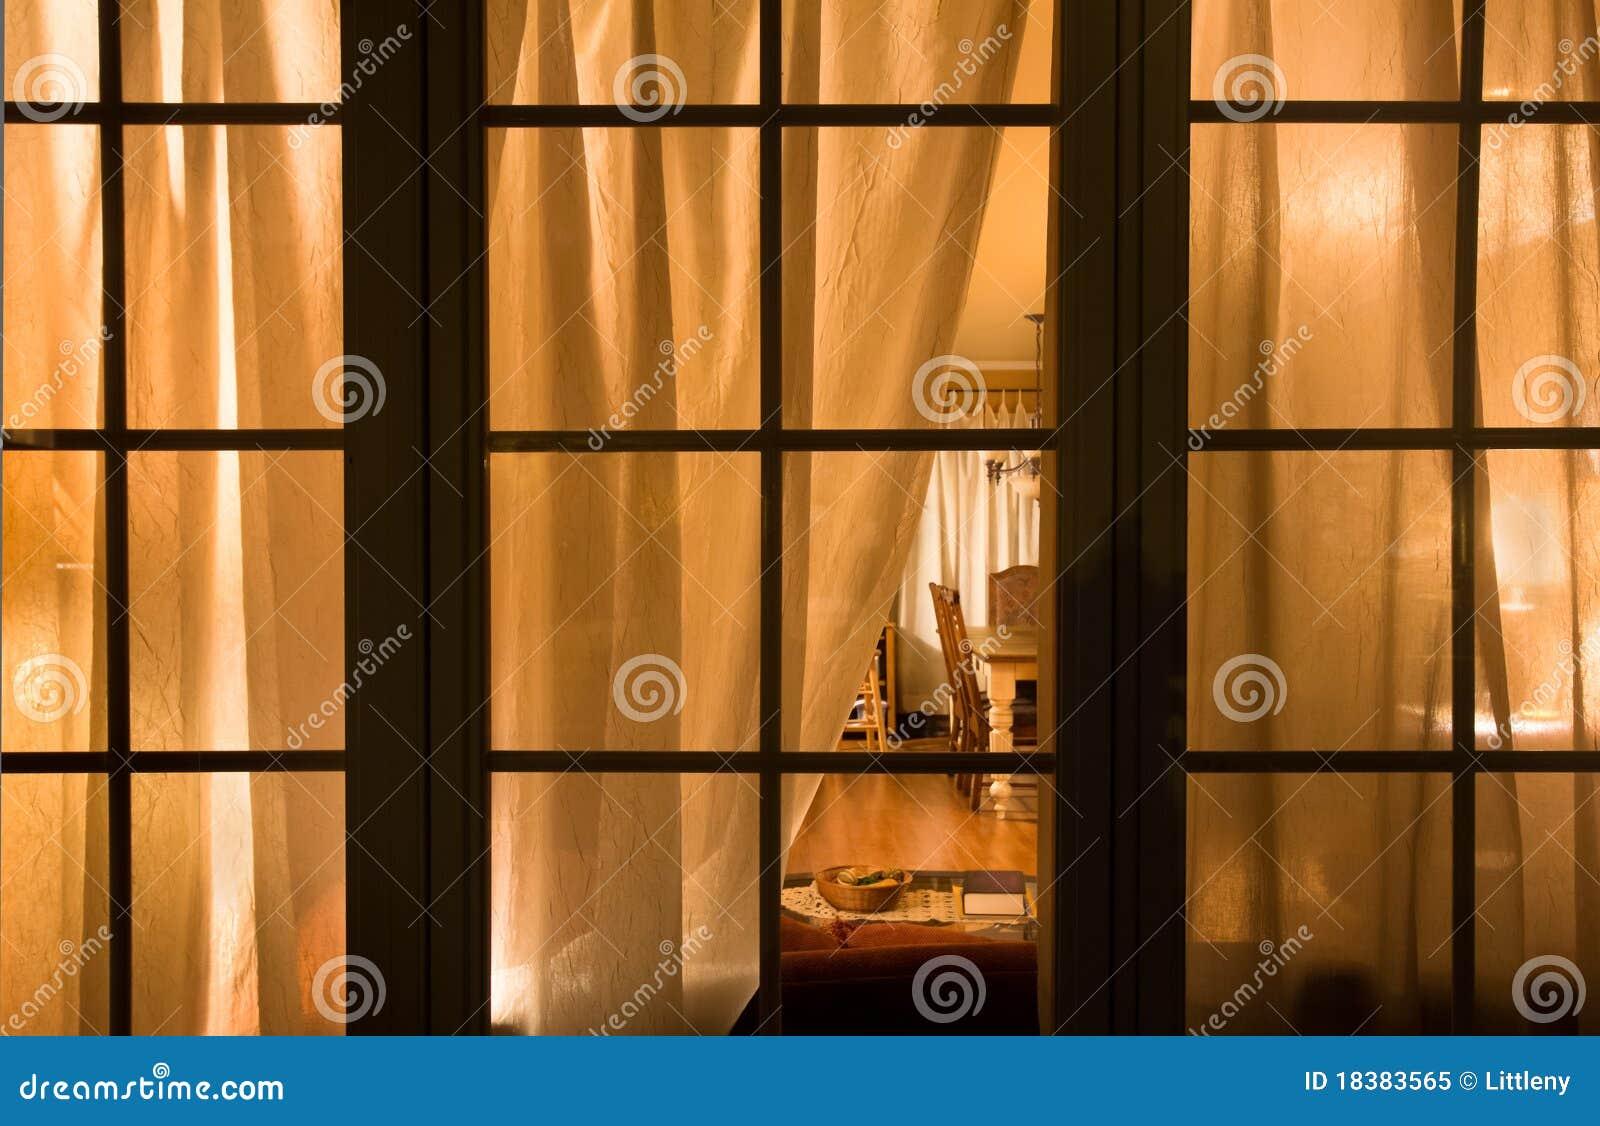 Window at night from inside - Home Interior Night Window